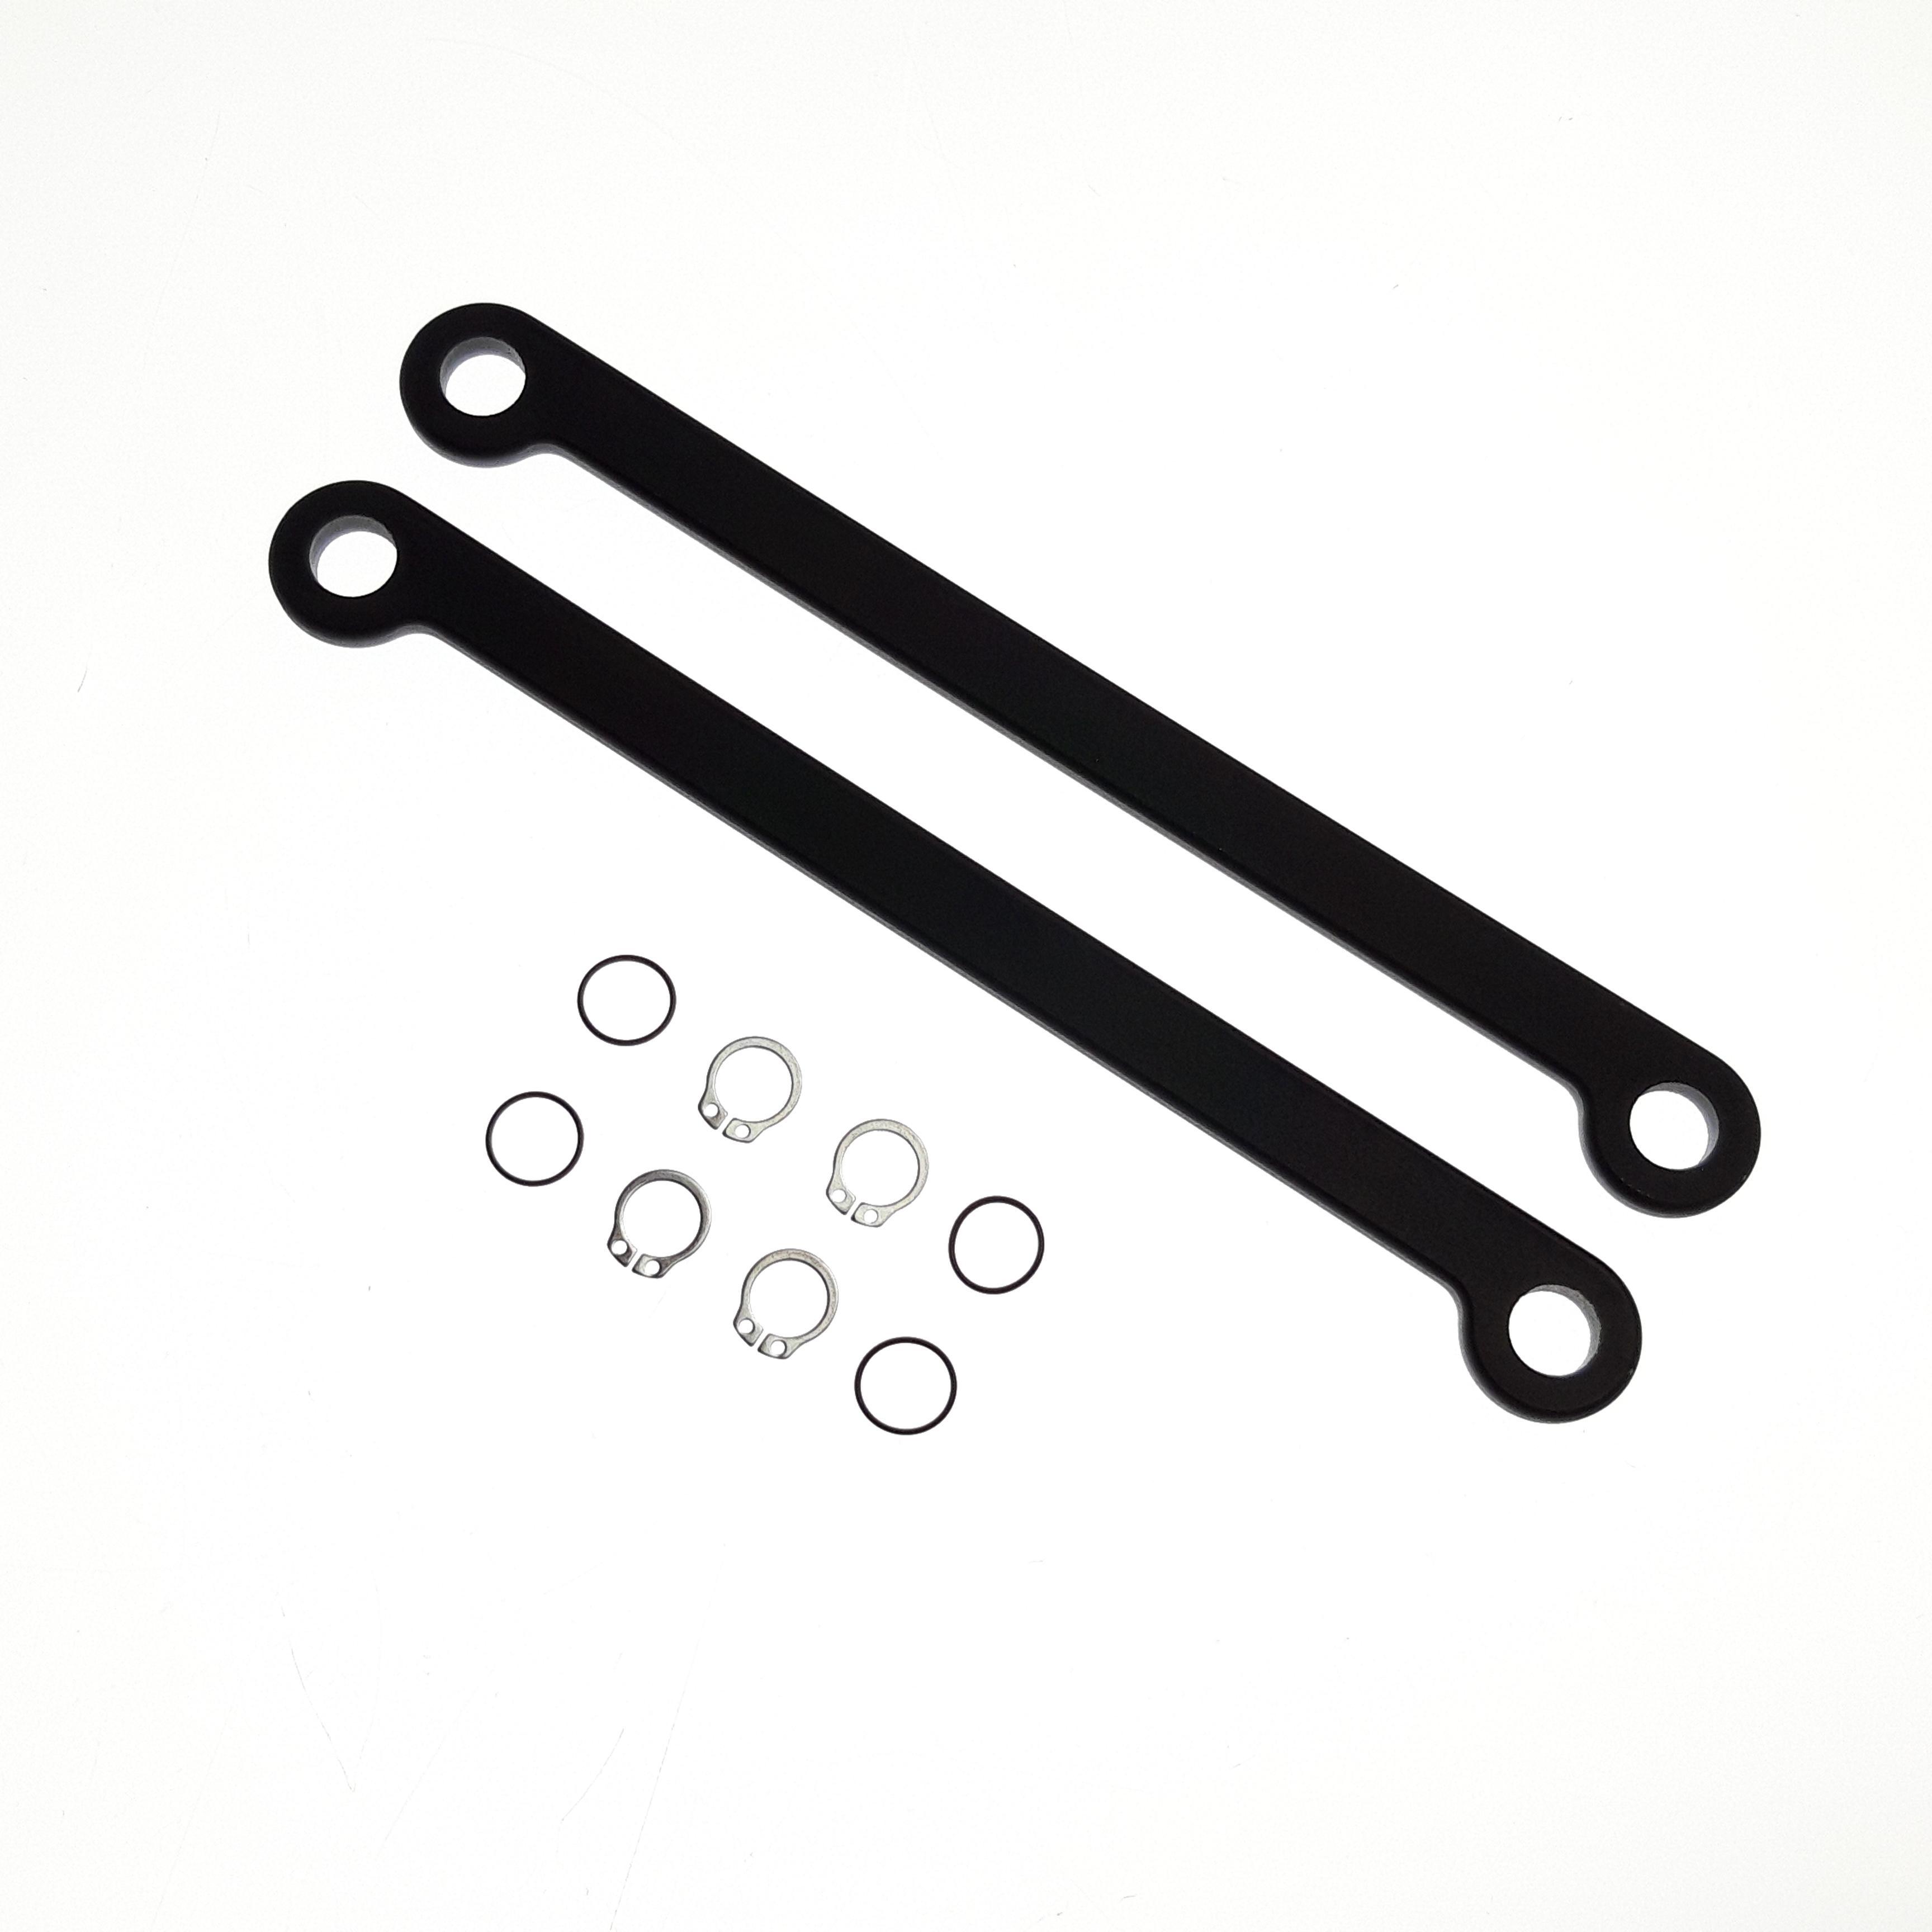 Short Straight Cross Kit GEN 3